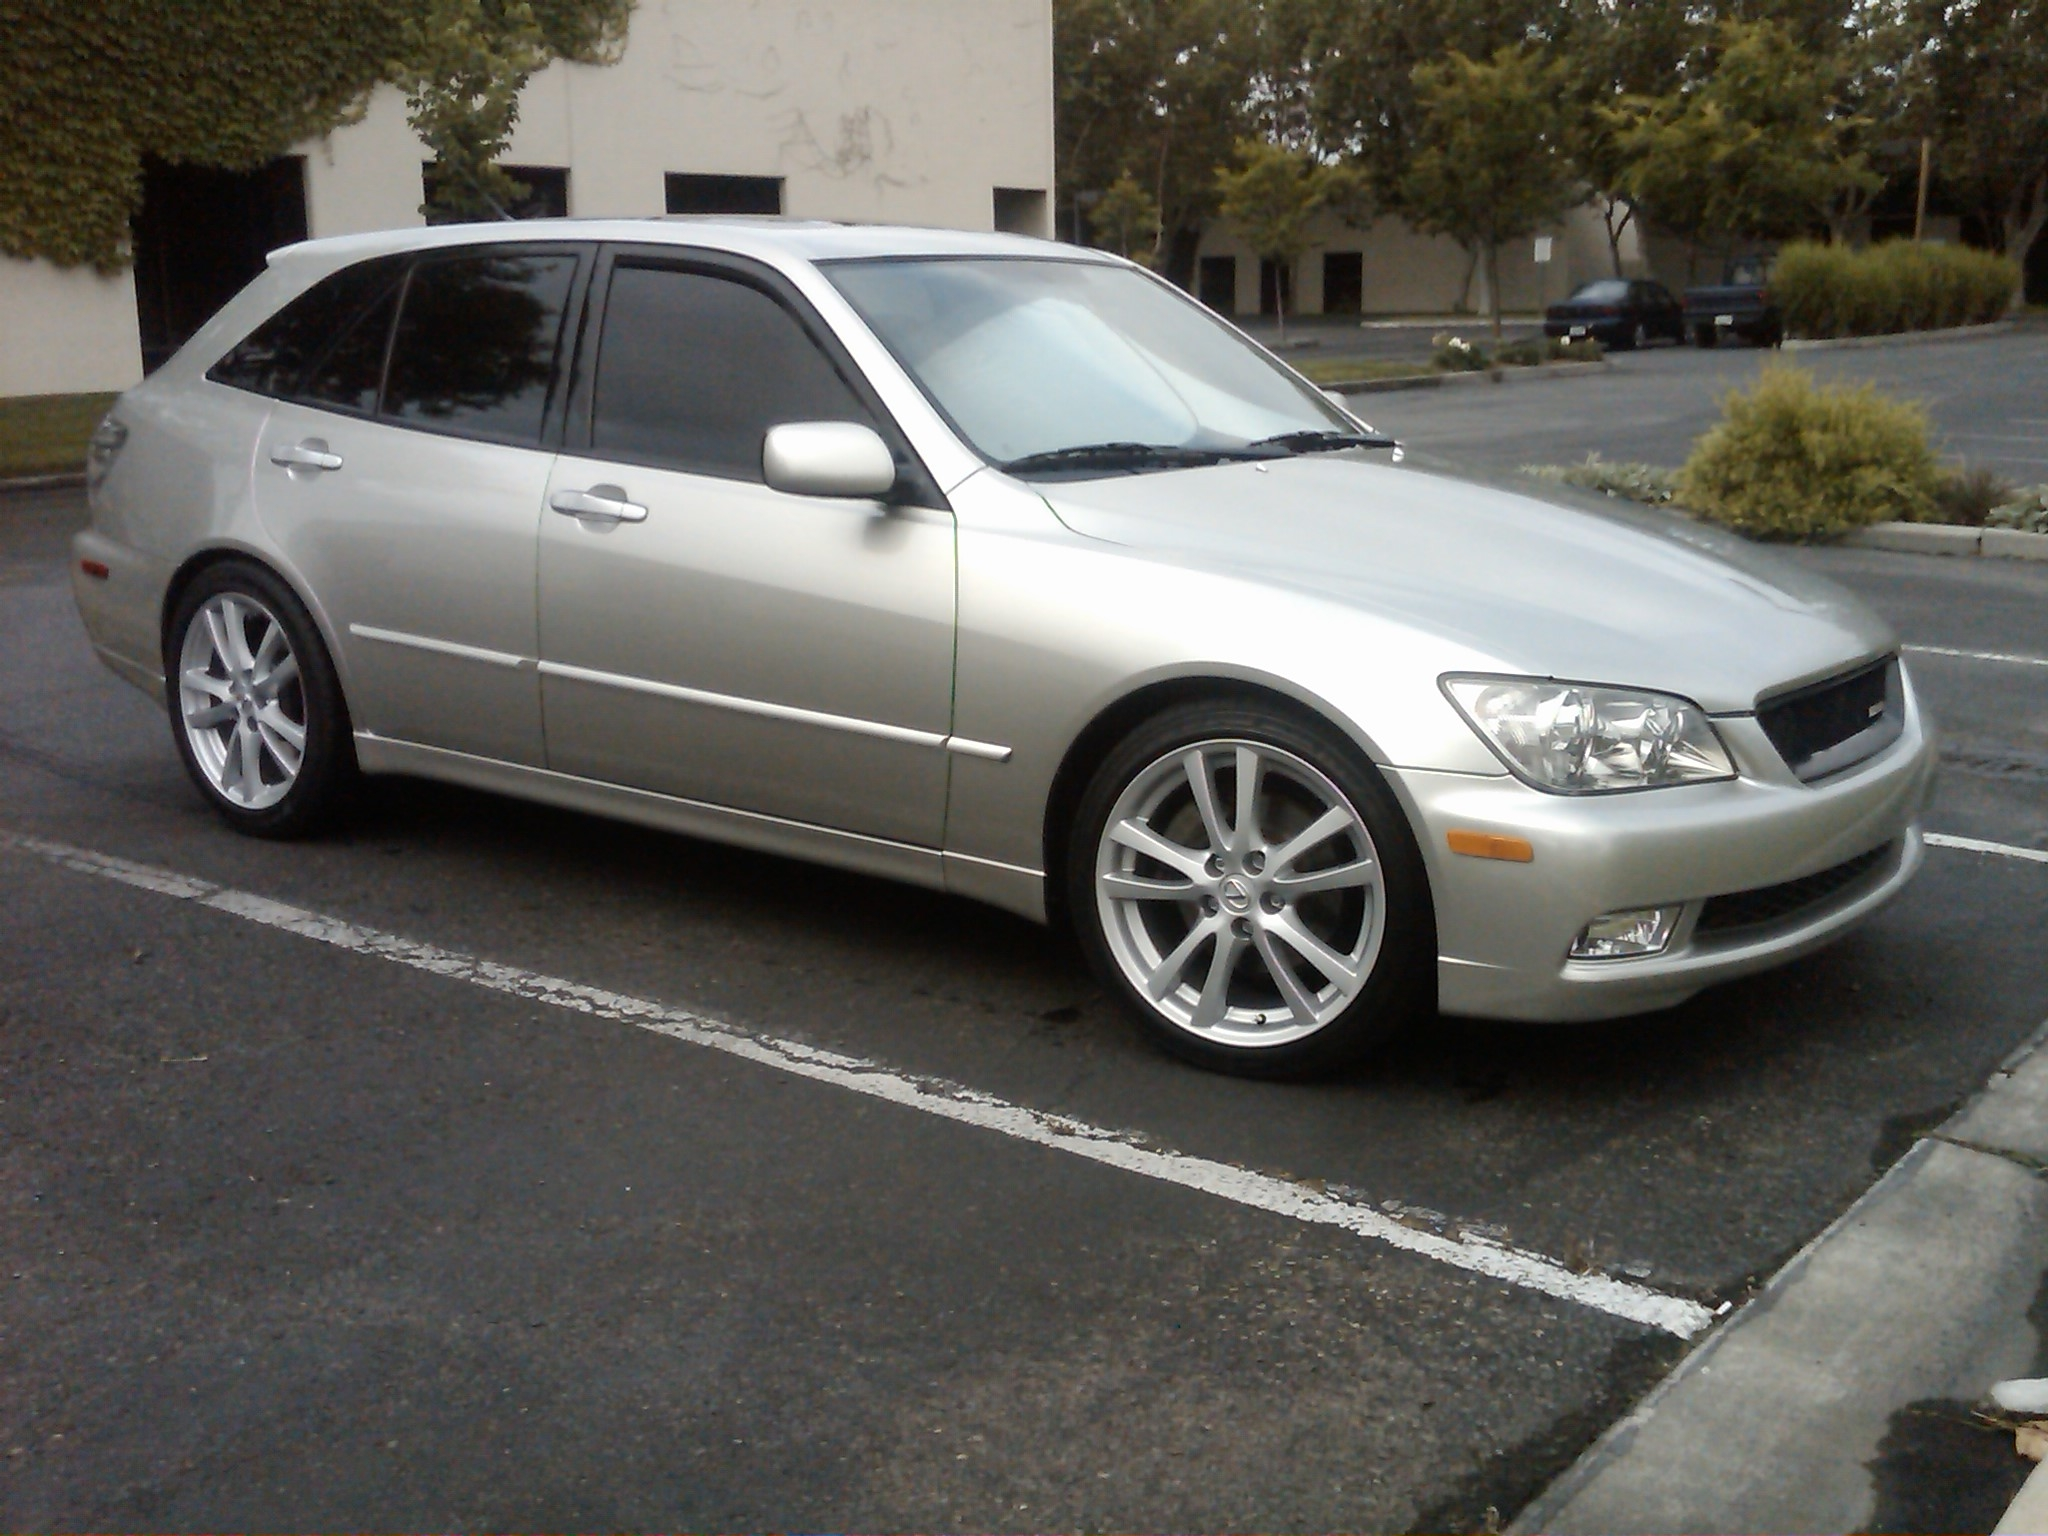 24164-isx50-wheels-is300-look-here-isx_r